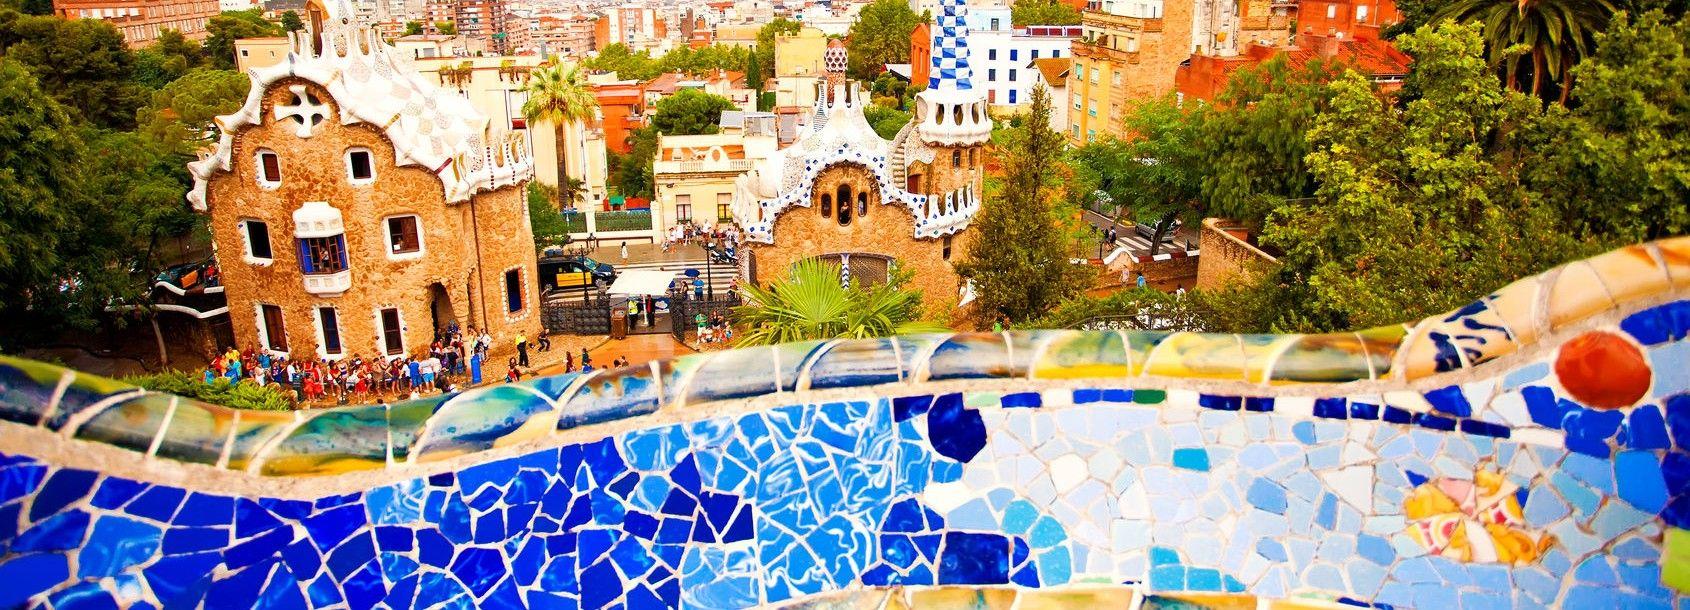 Sagrada Família et Parc Güell: billet et visite guidée